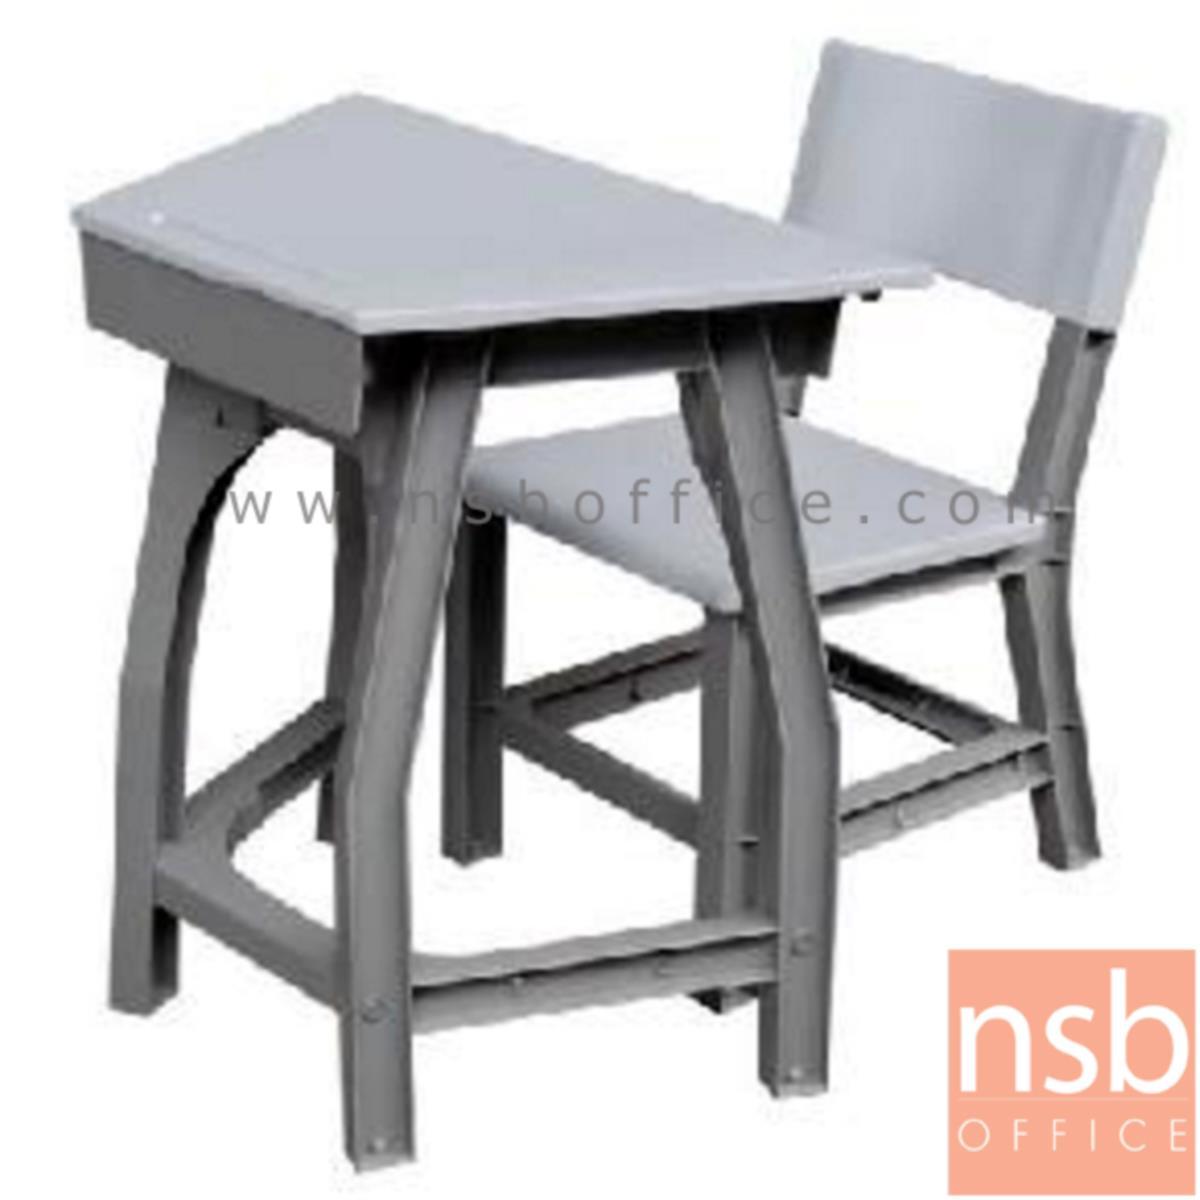 A17A039:ชุดโต๊ะและเก้าอี้นักเรียน รุ่น Antique (แอนทีค)  ระดับชั้นอนุบาล ขาพลาสติก